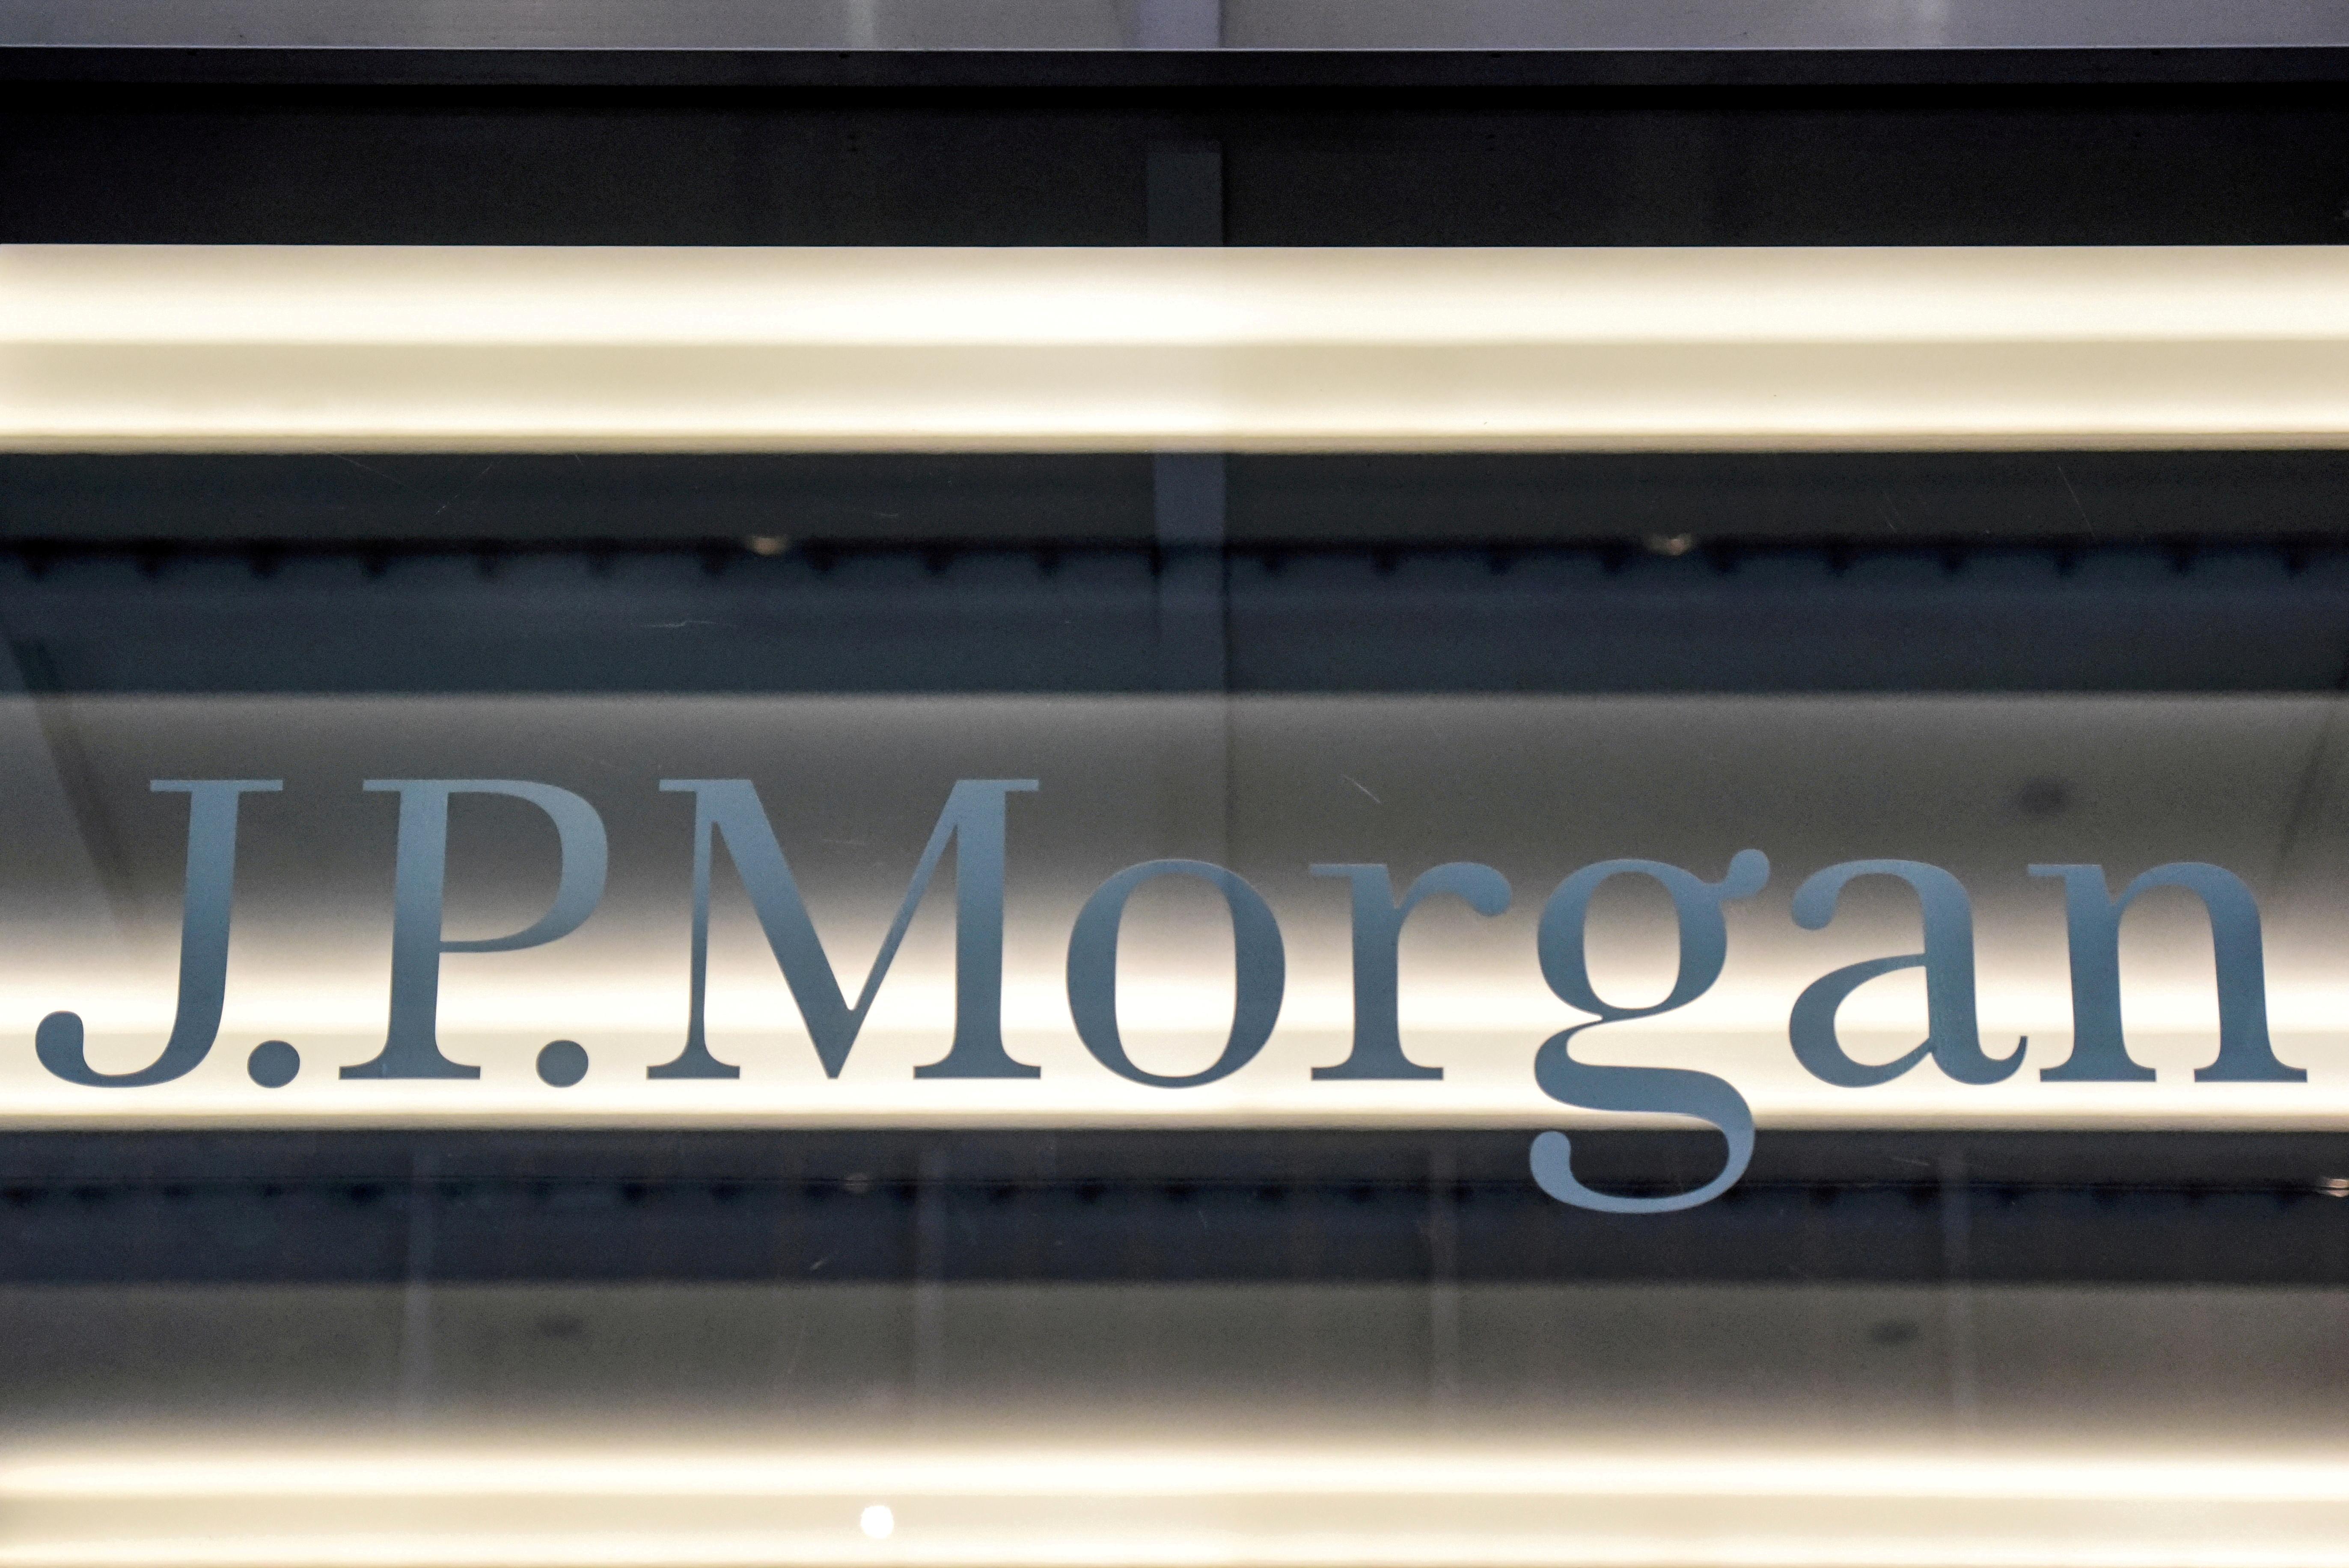 A JPMorgan logo is seen in New York City, U.S., January 10, 2017. REUTERS/Stephanie Keith/File Photo